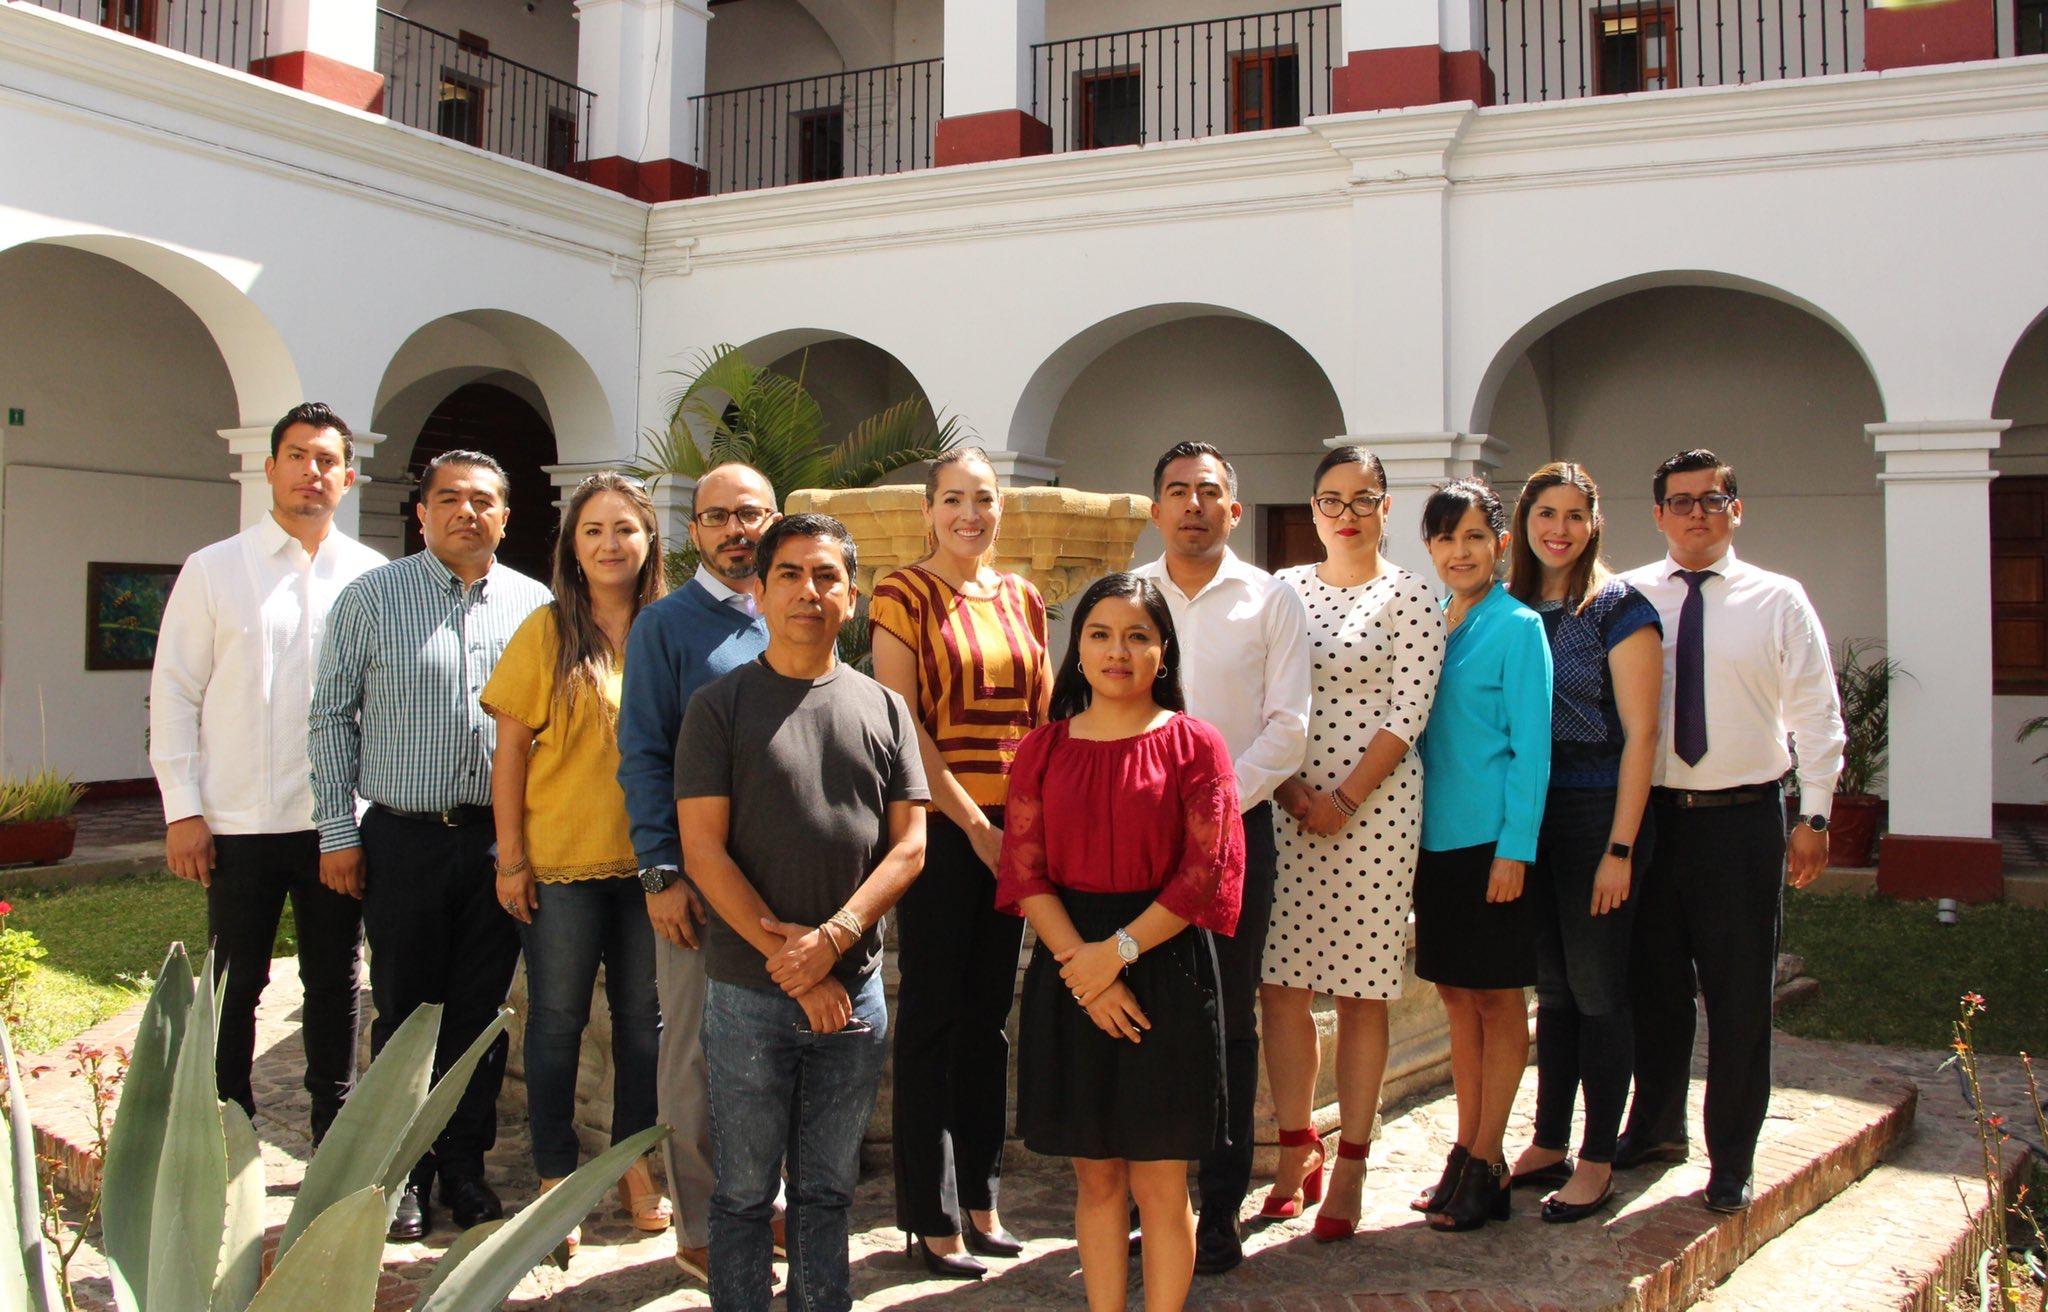 Sesiona Junta Directiva de la Casa de la Cultura Oaxaqueña